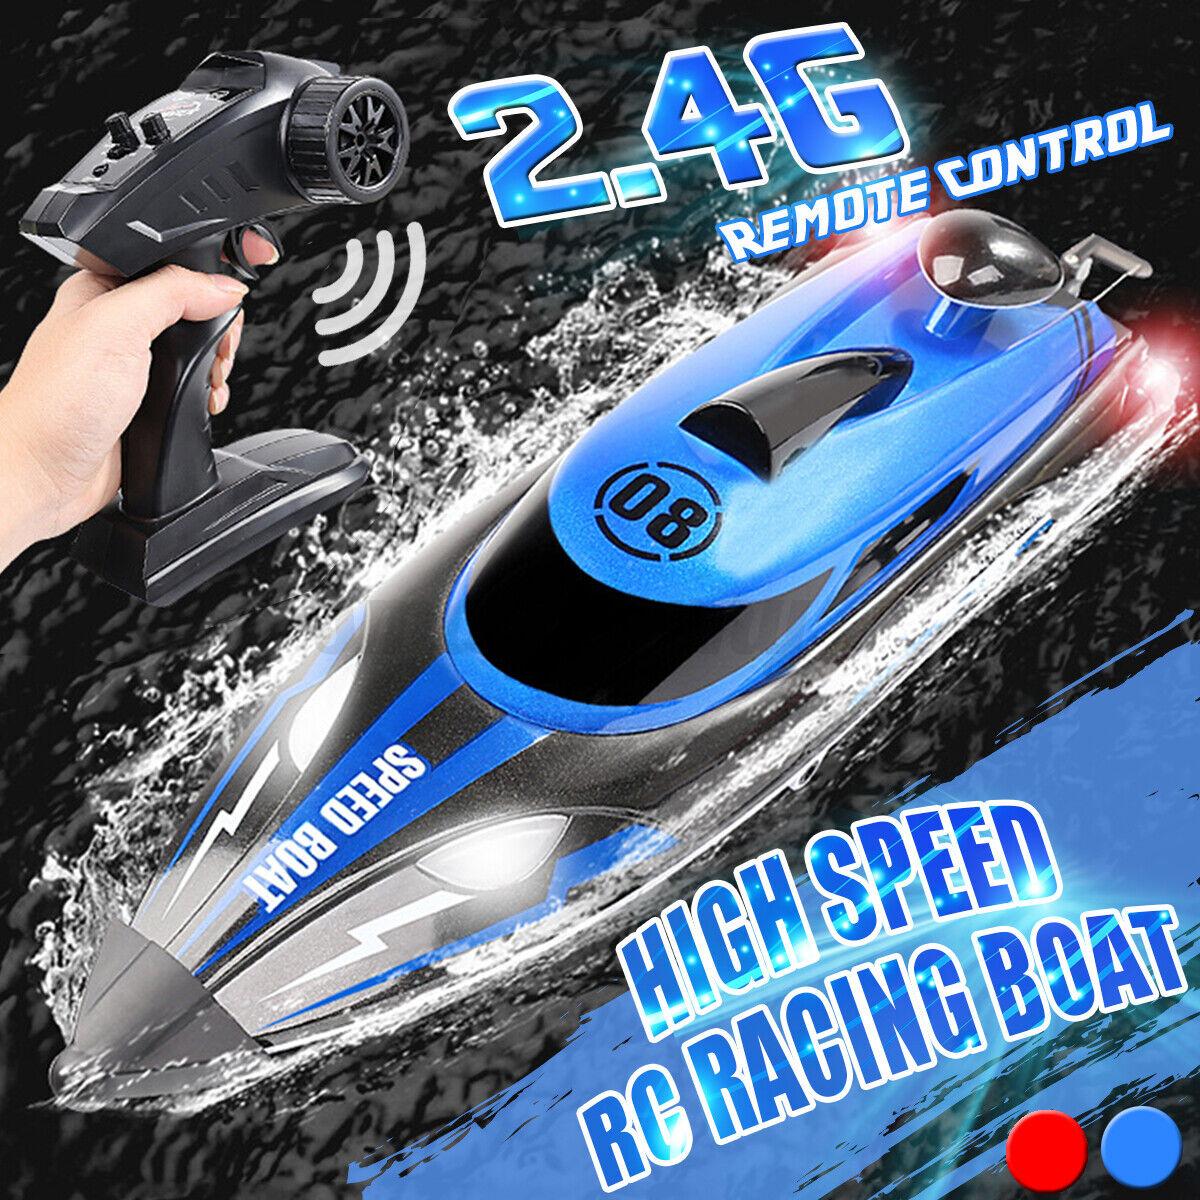 6S Lipo 106cm 2,4 GHz NEU RC Rennboot Speedboot ALPHA red Brushless 80km//h 4S